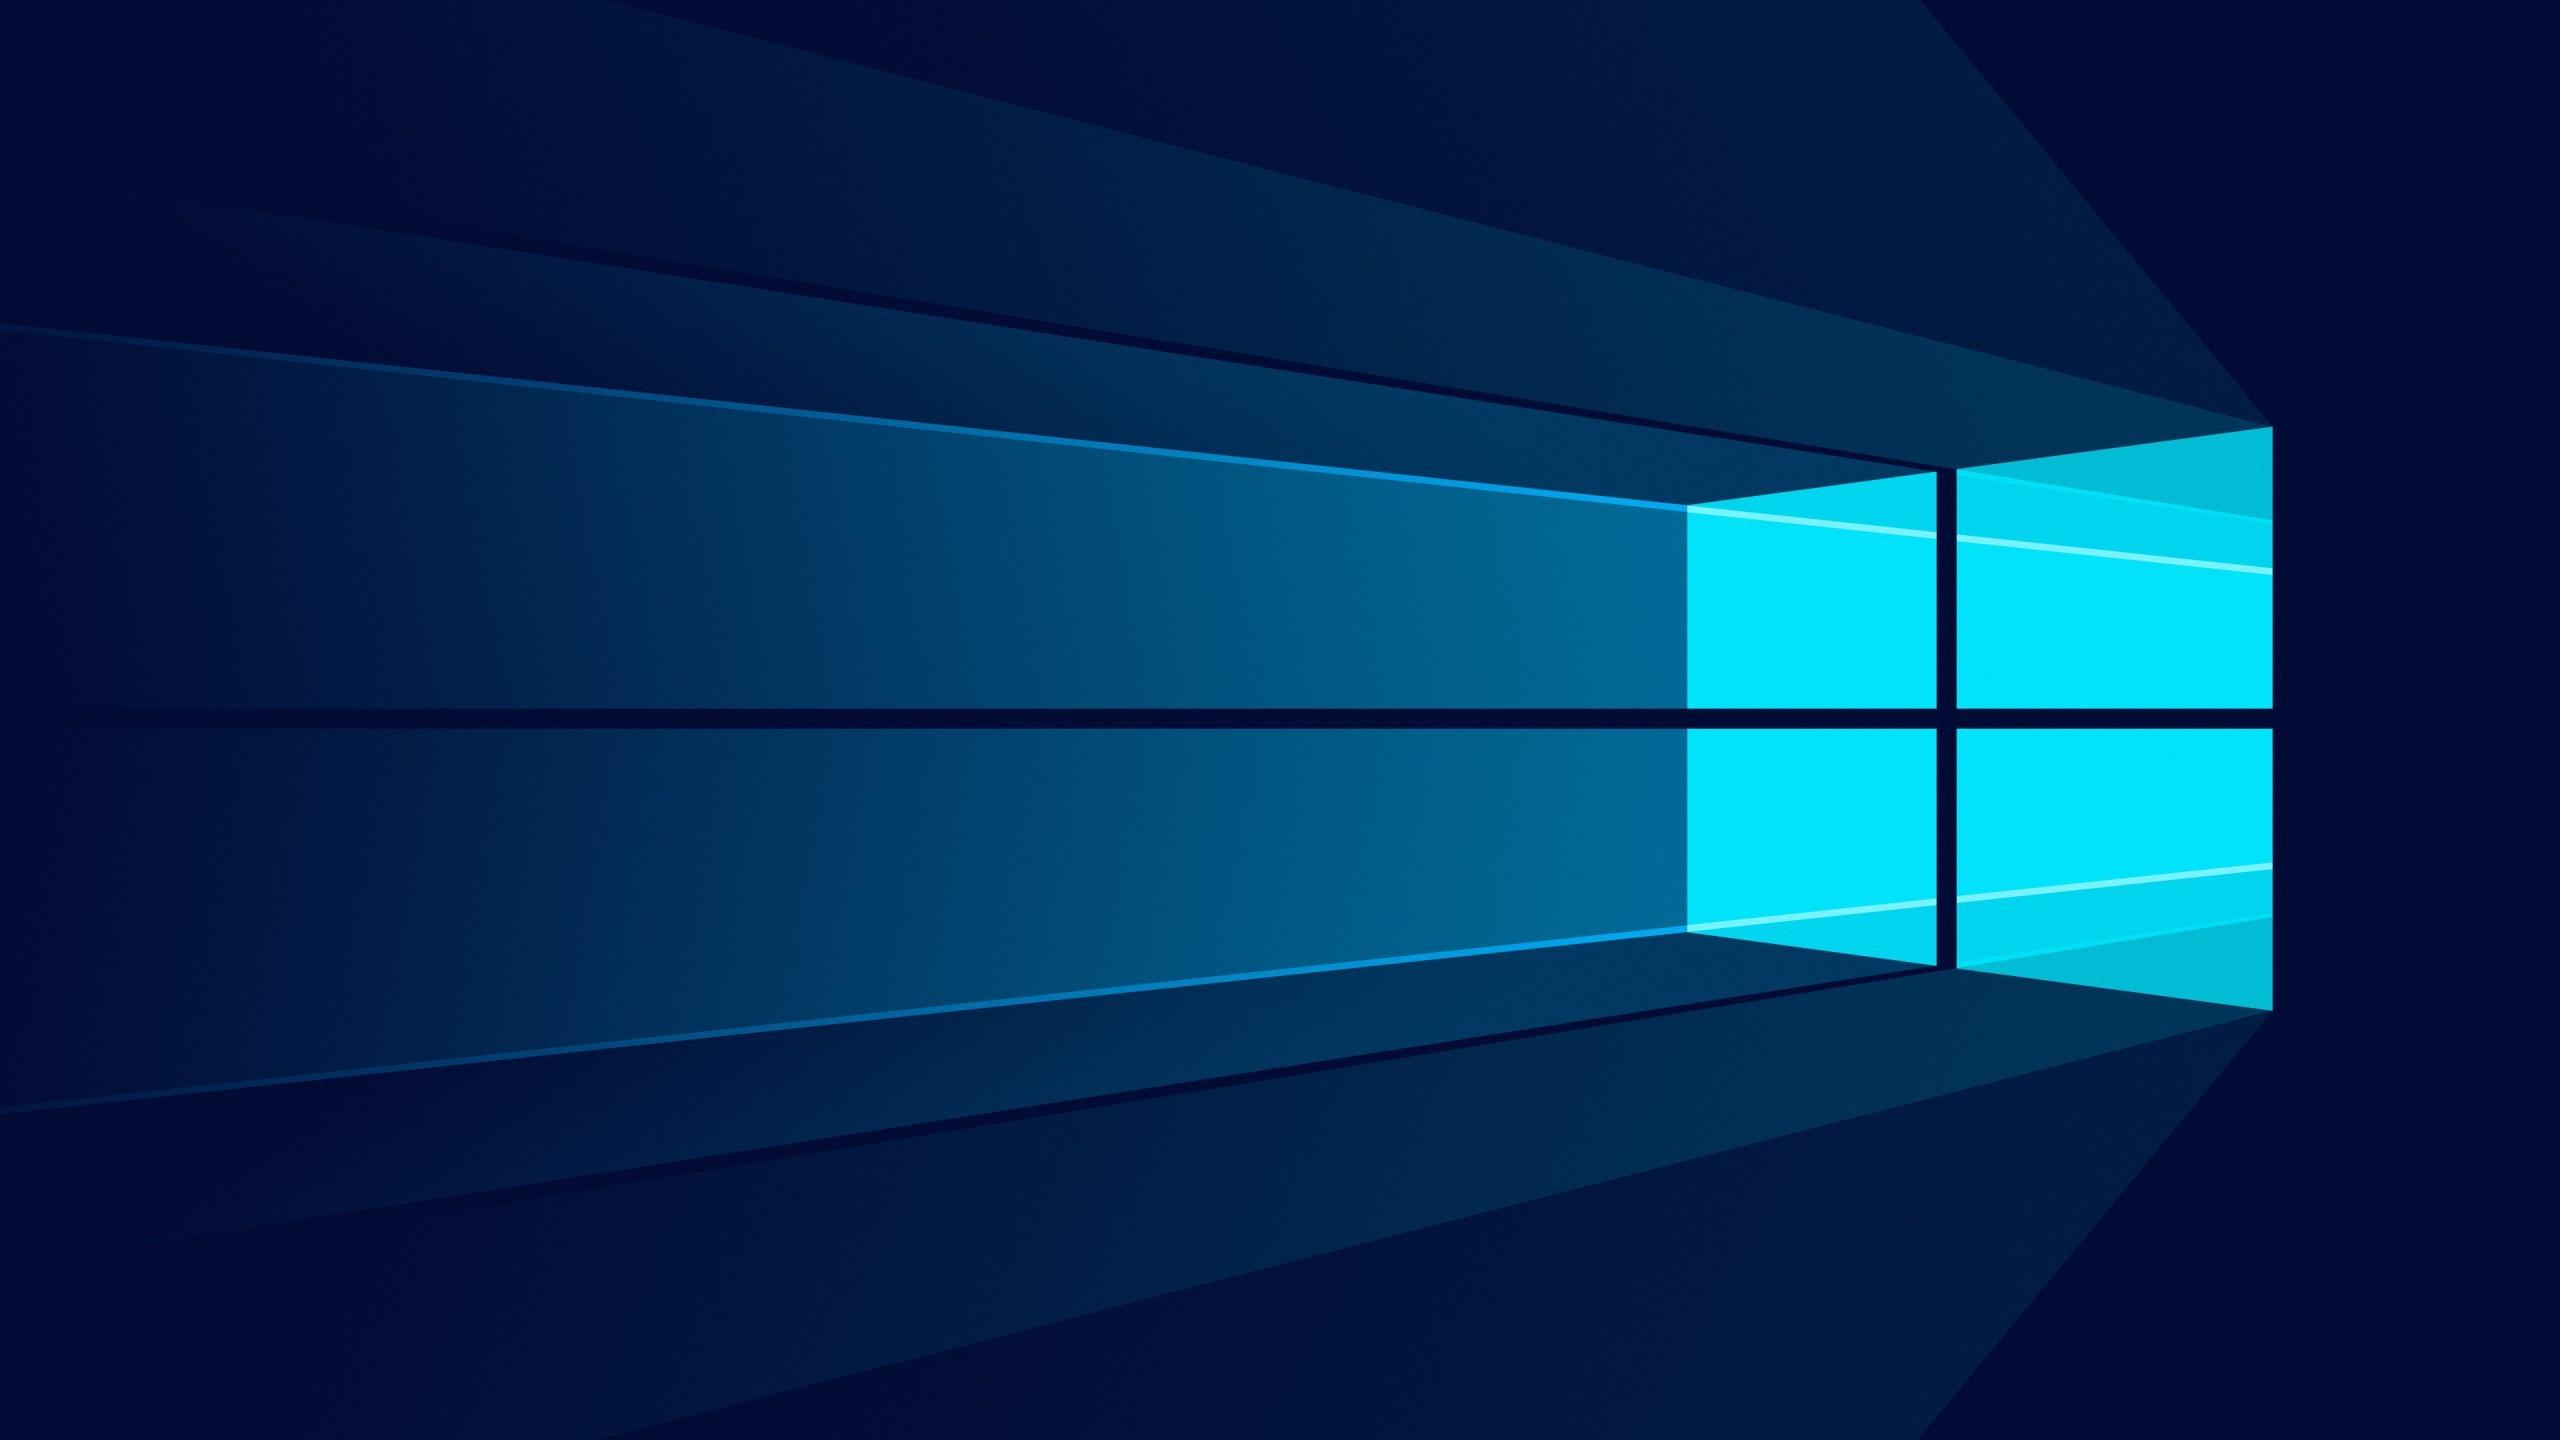 Res: 2560x1440, Windows 10 Minimal